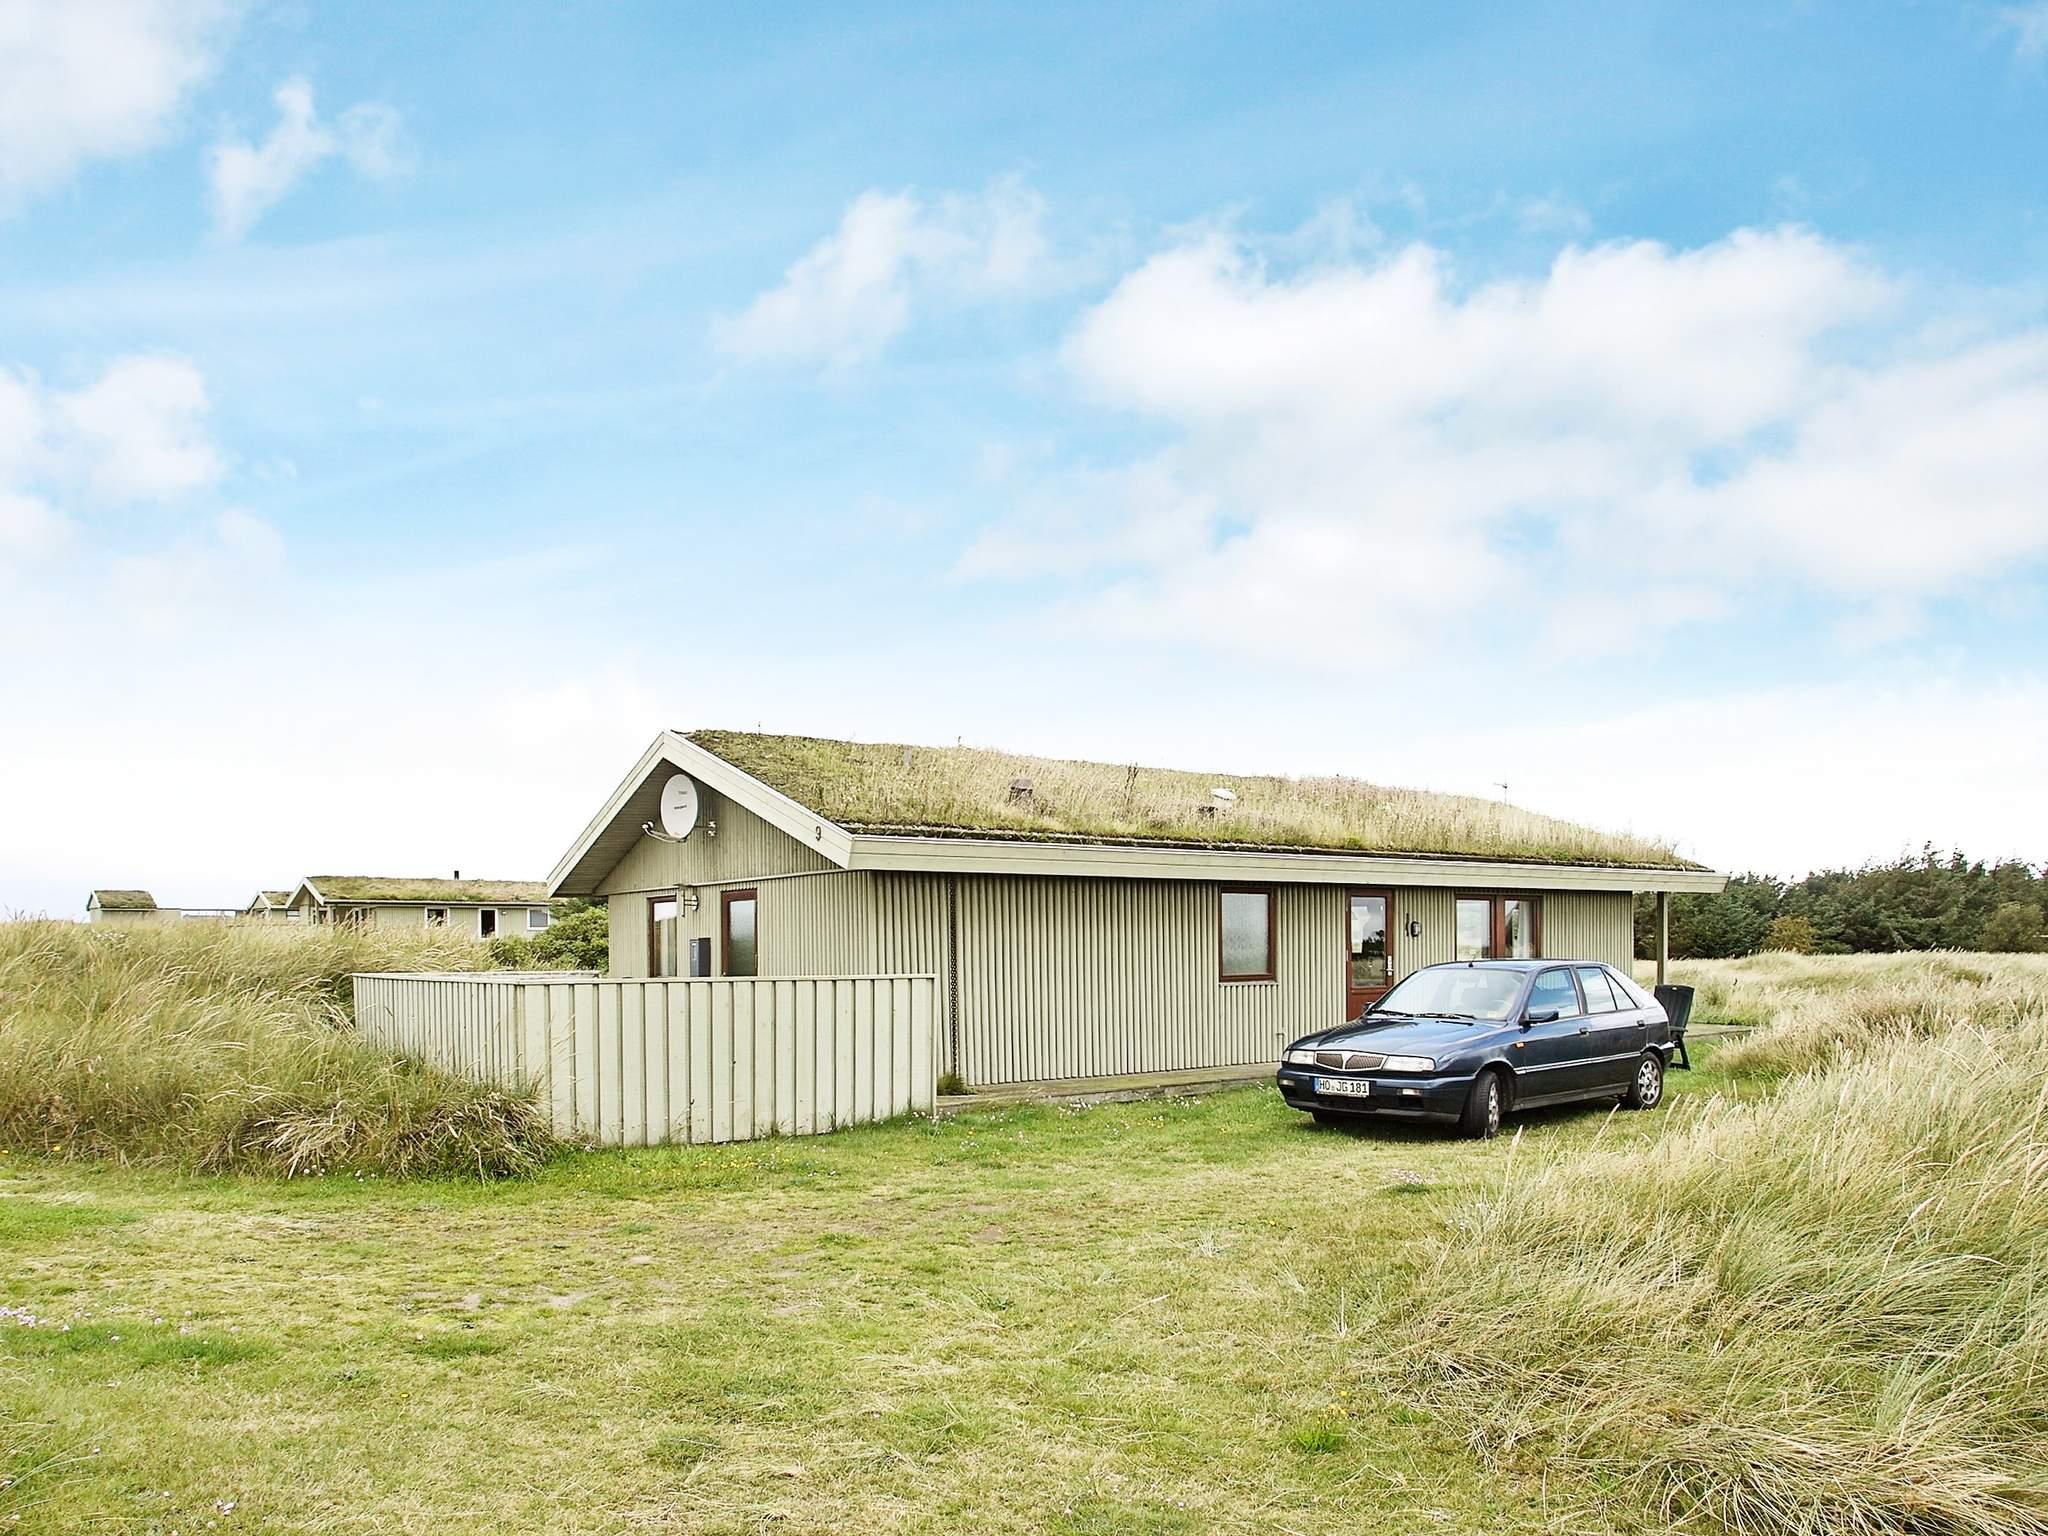 Ferienhaus Grønhøj Strand (83808), Løkken, , Nordwestjütland, Dänemark, Bild 17